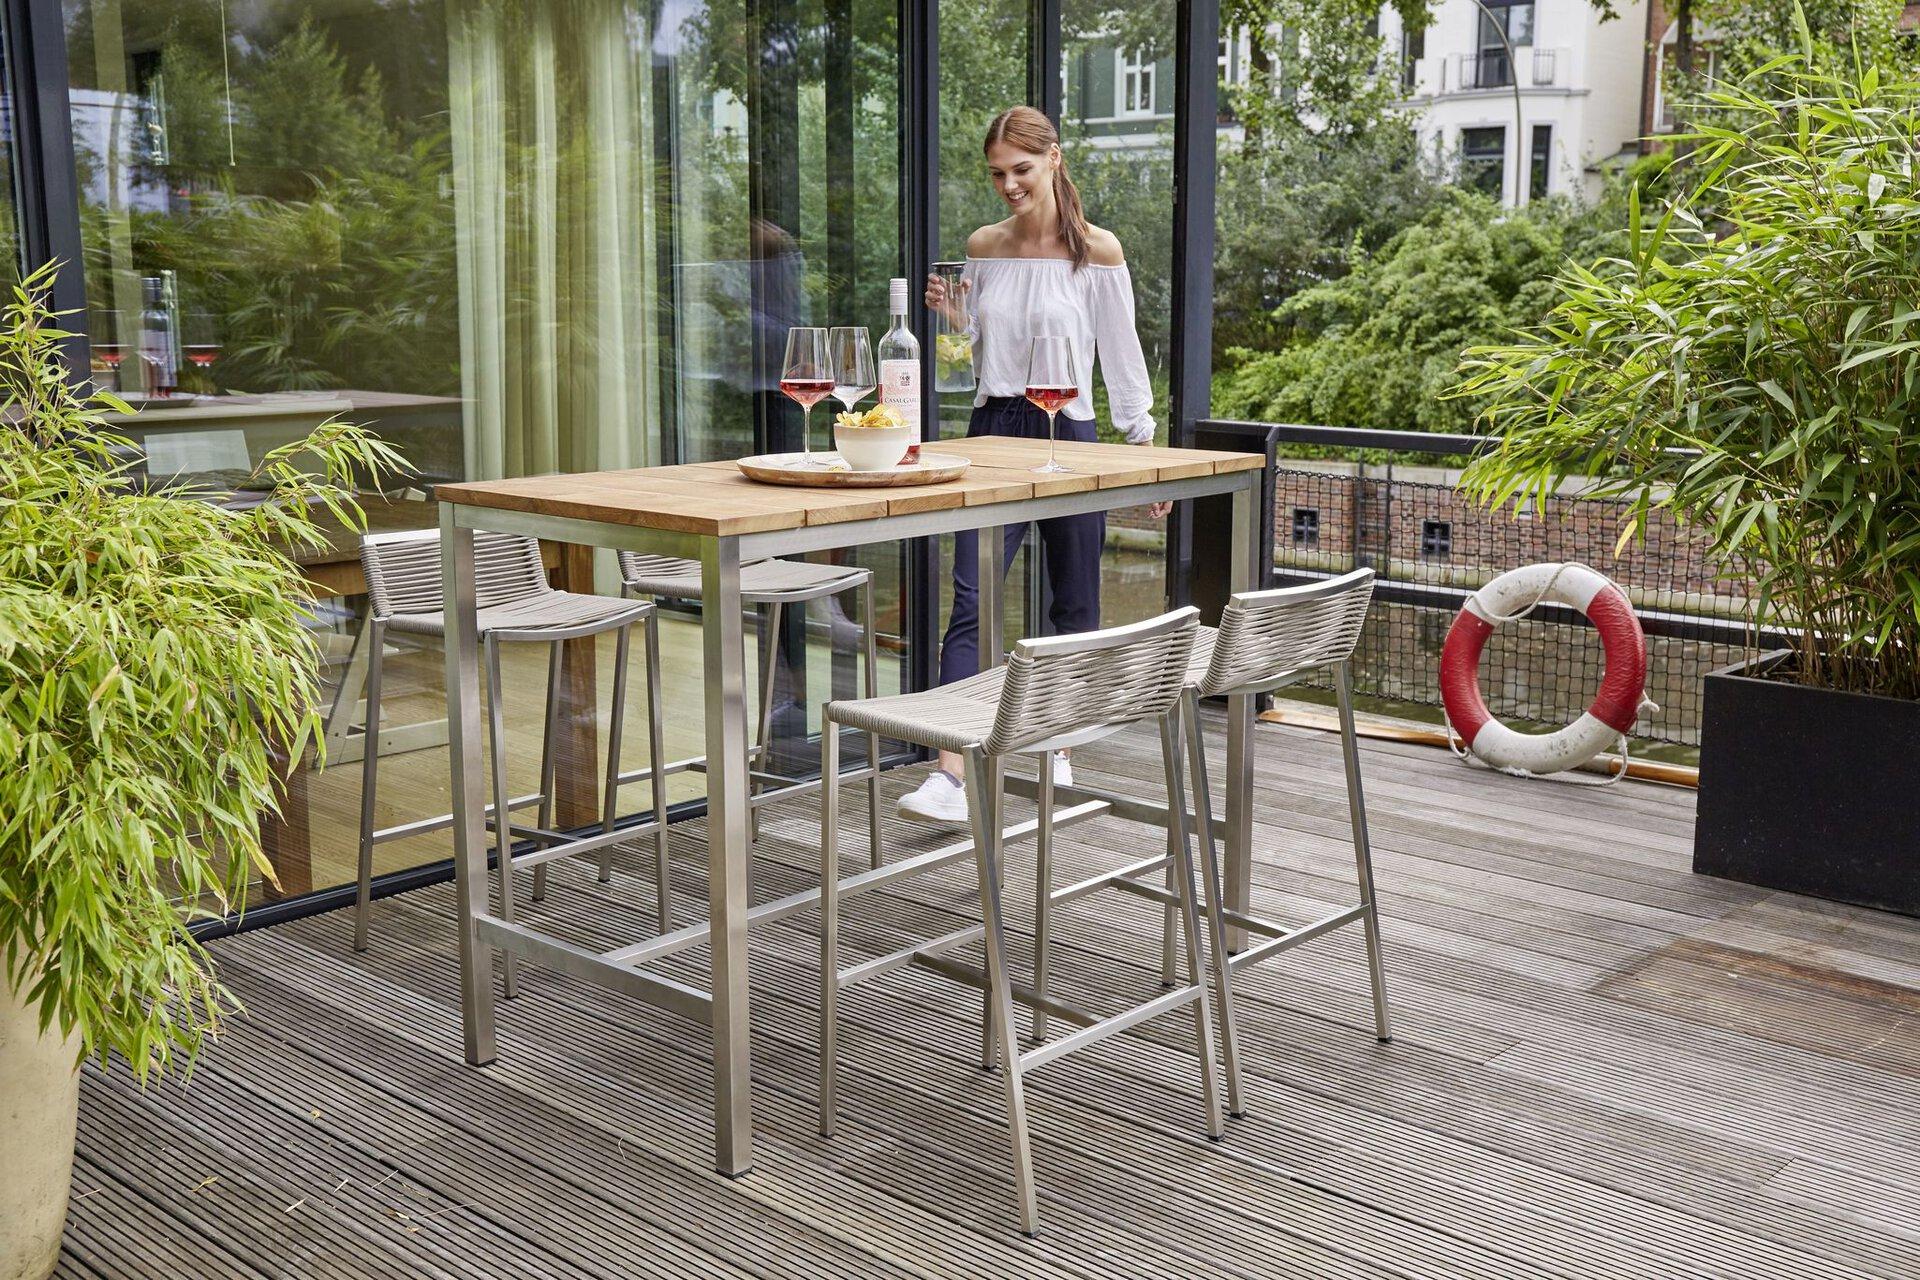 Barhocker U2372C-Bar Outdoor Metall braun 41 x 85 x 45 cm